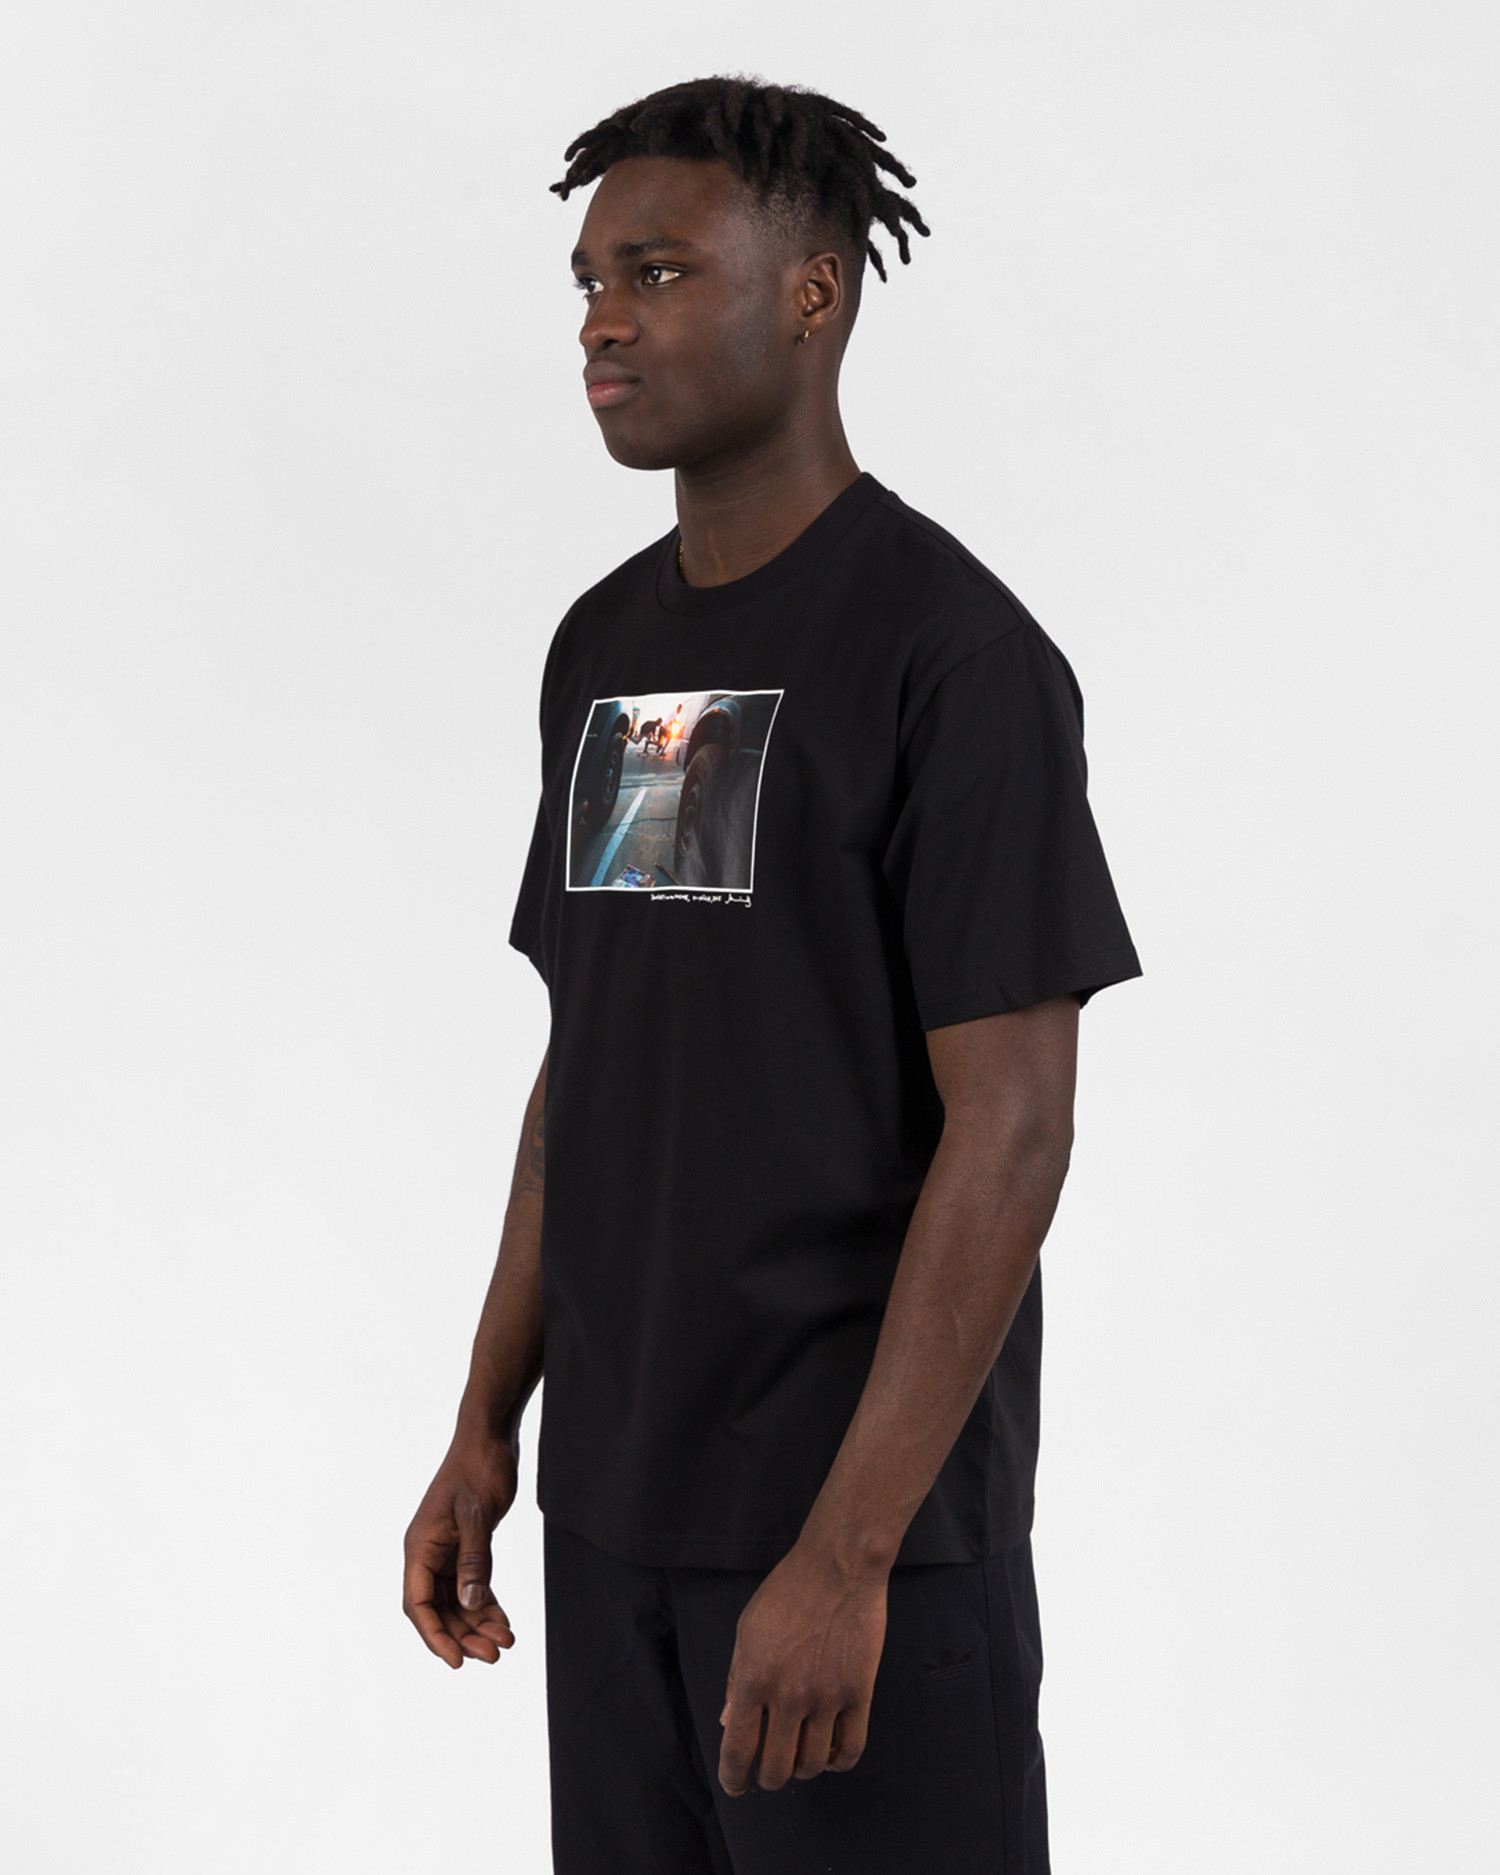 Adidas Omeally Shortsleeve Tee Black